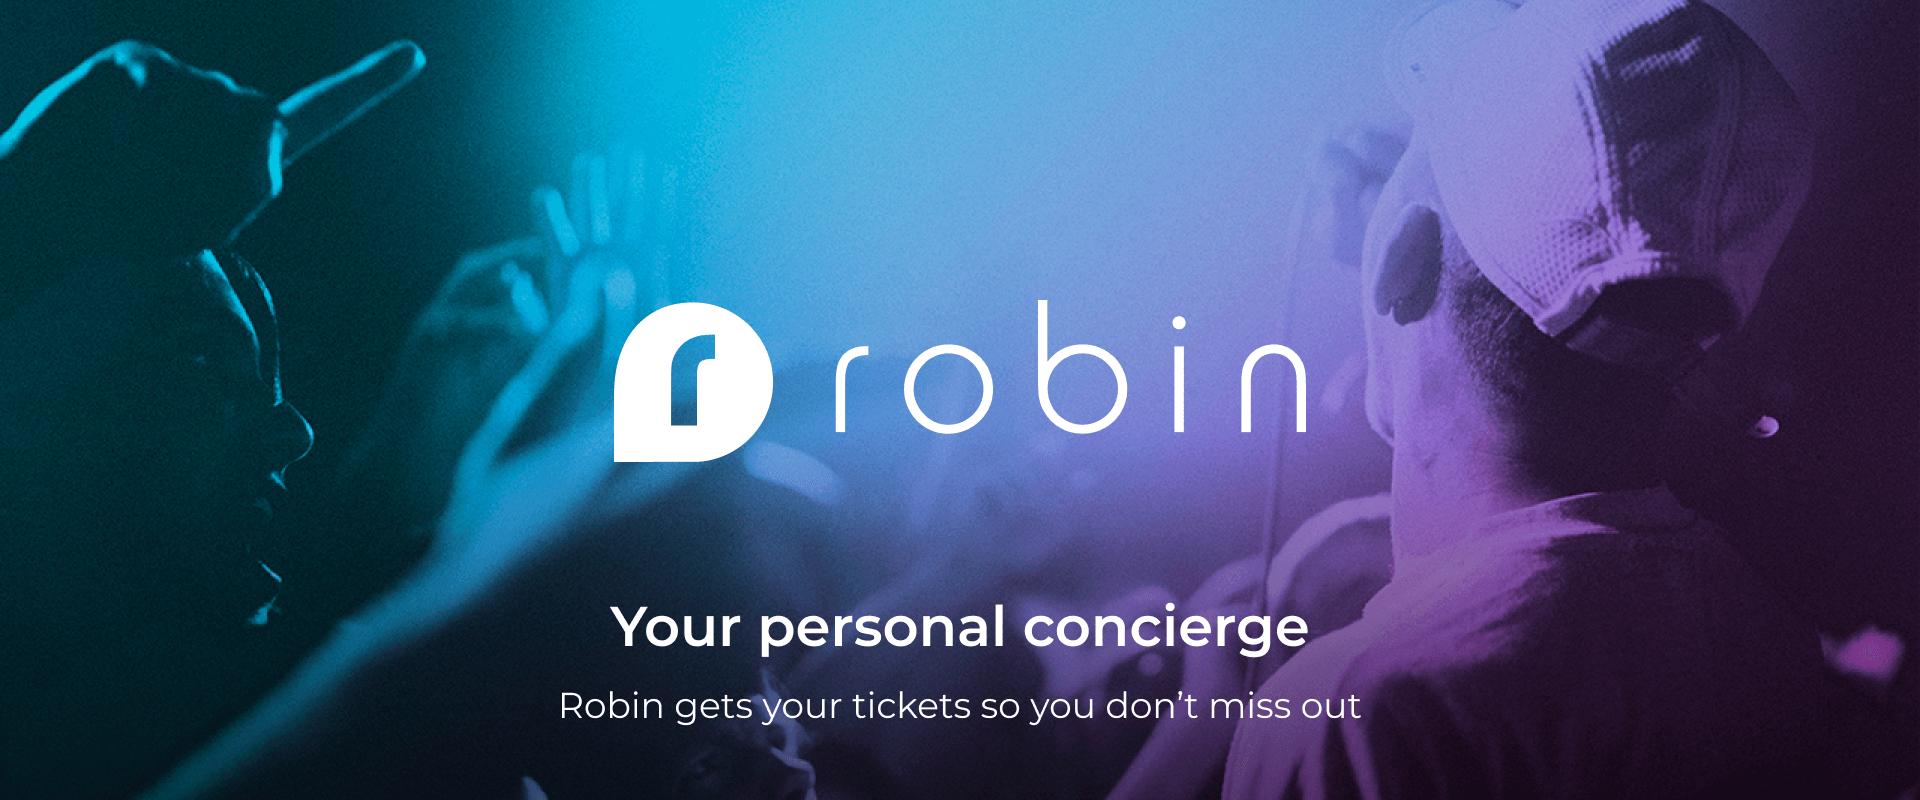 robinb2c-header_S.png